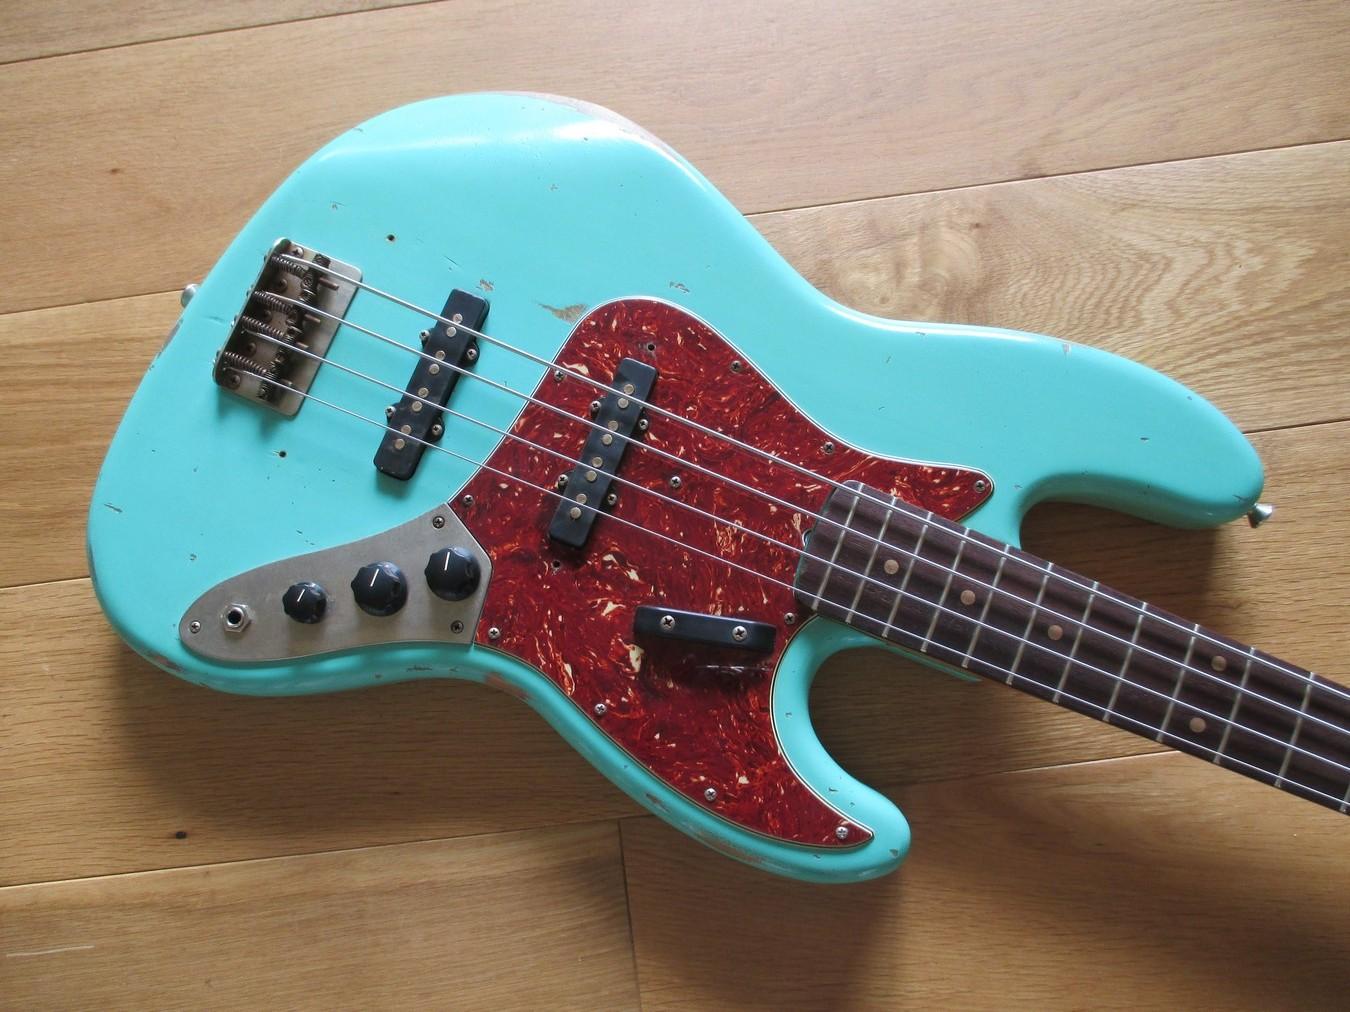 limelight 00134 j bass classic cool guitars. Black Bedroom Furniture Sets. Home Design Ideas